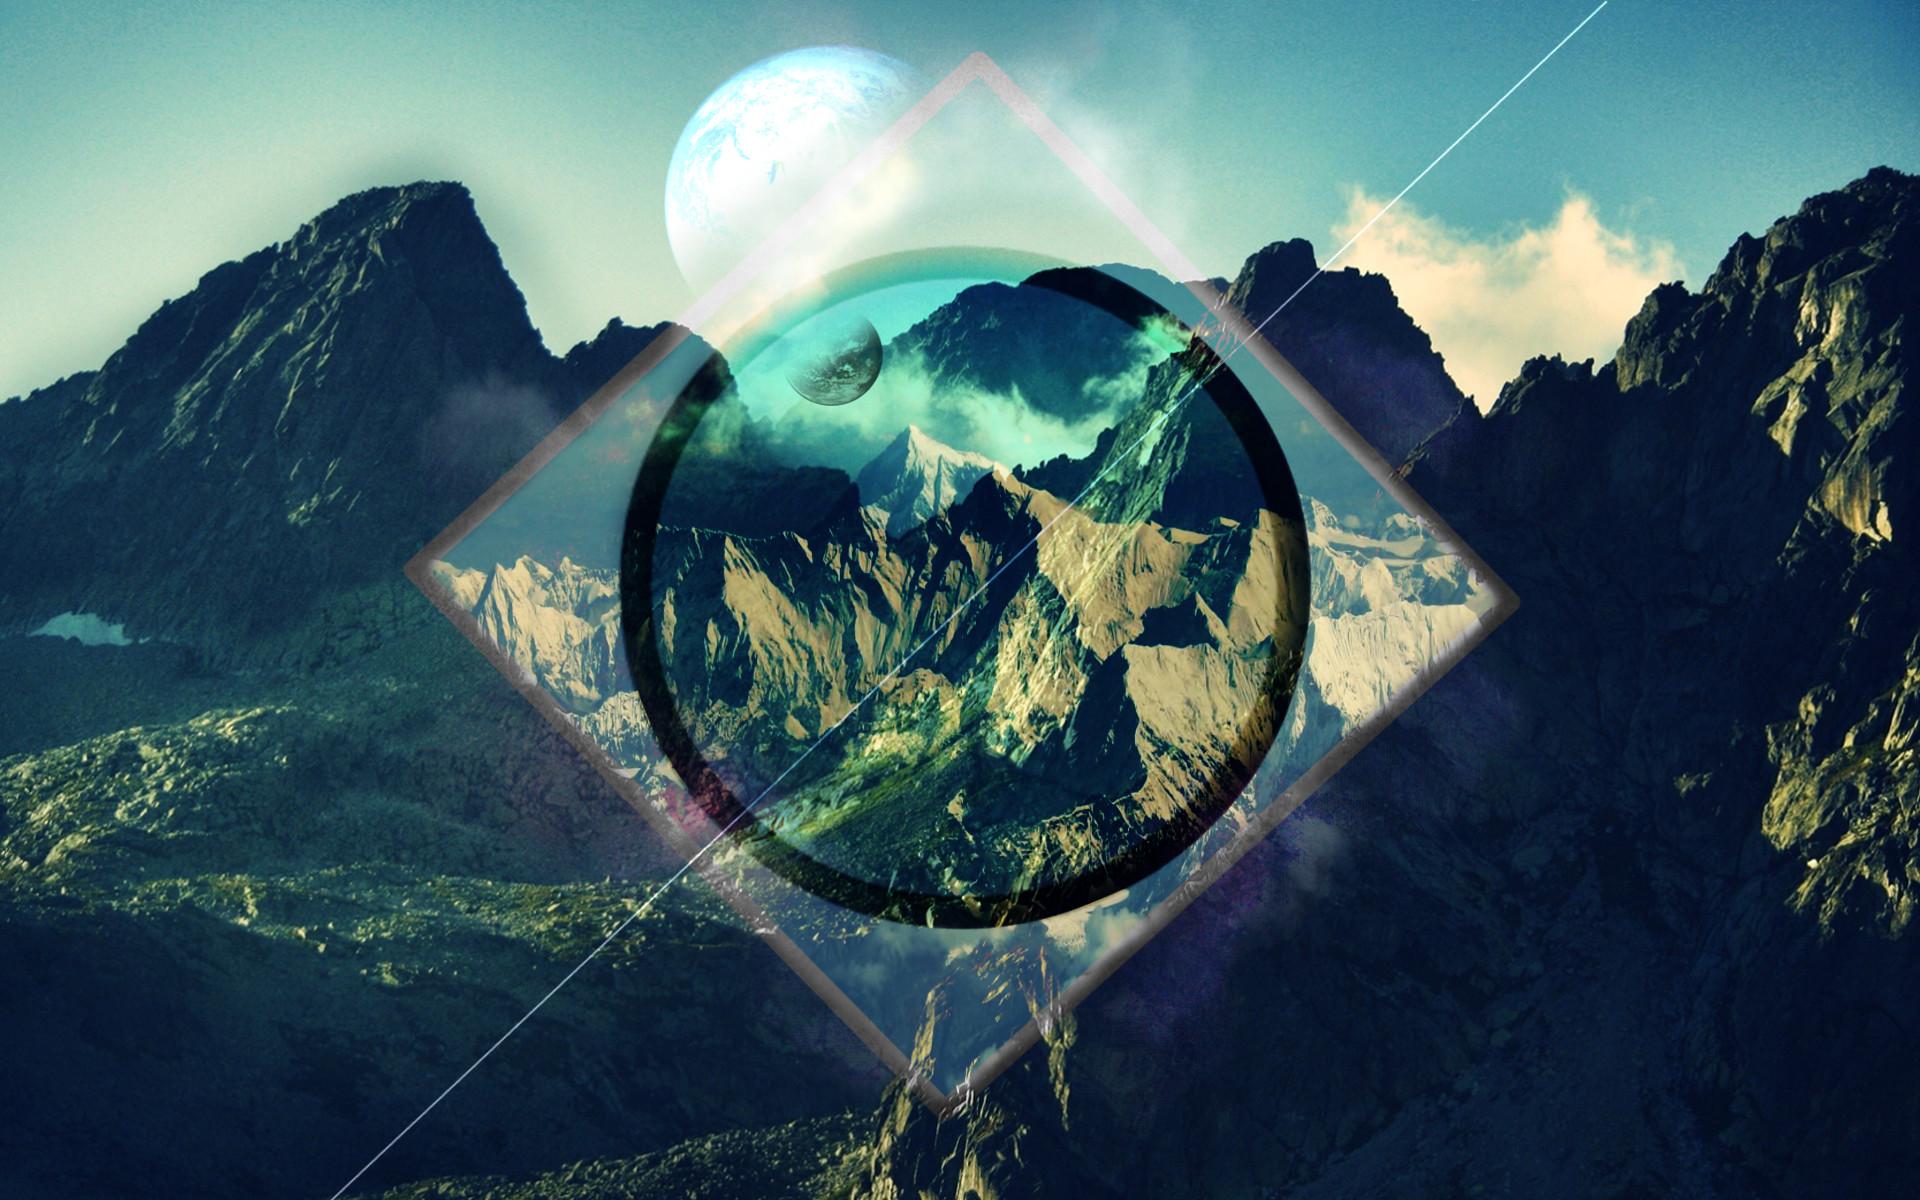 Mountain Wallpaper Tumblr by Predvkill on DeviantArt